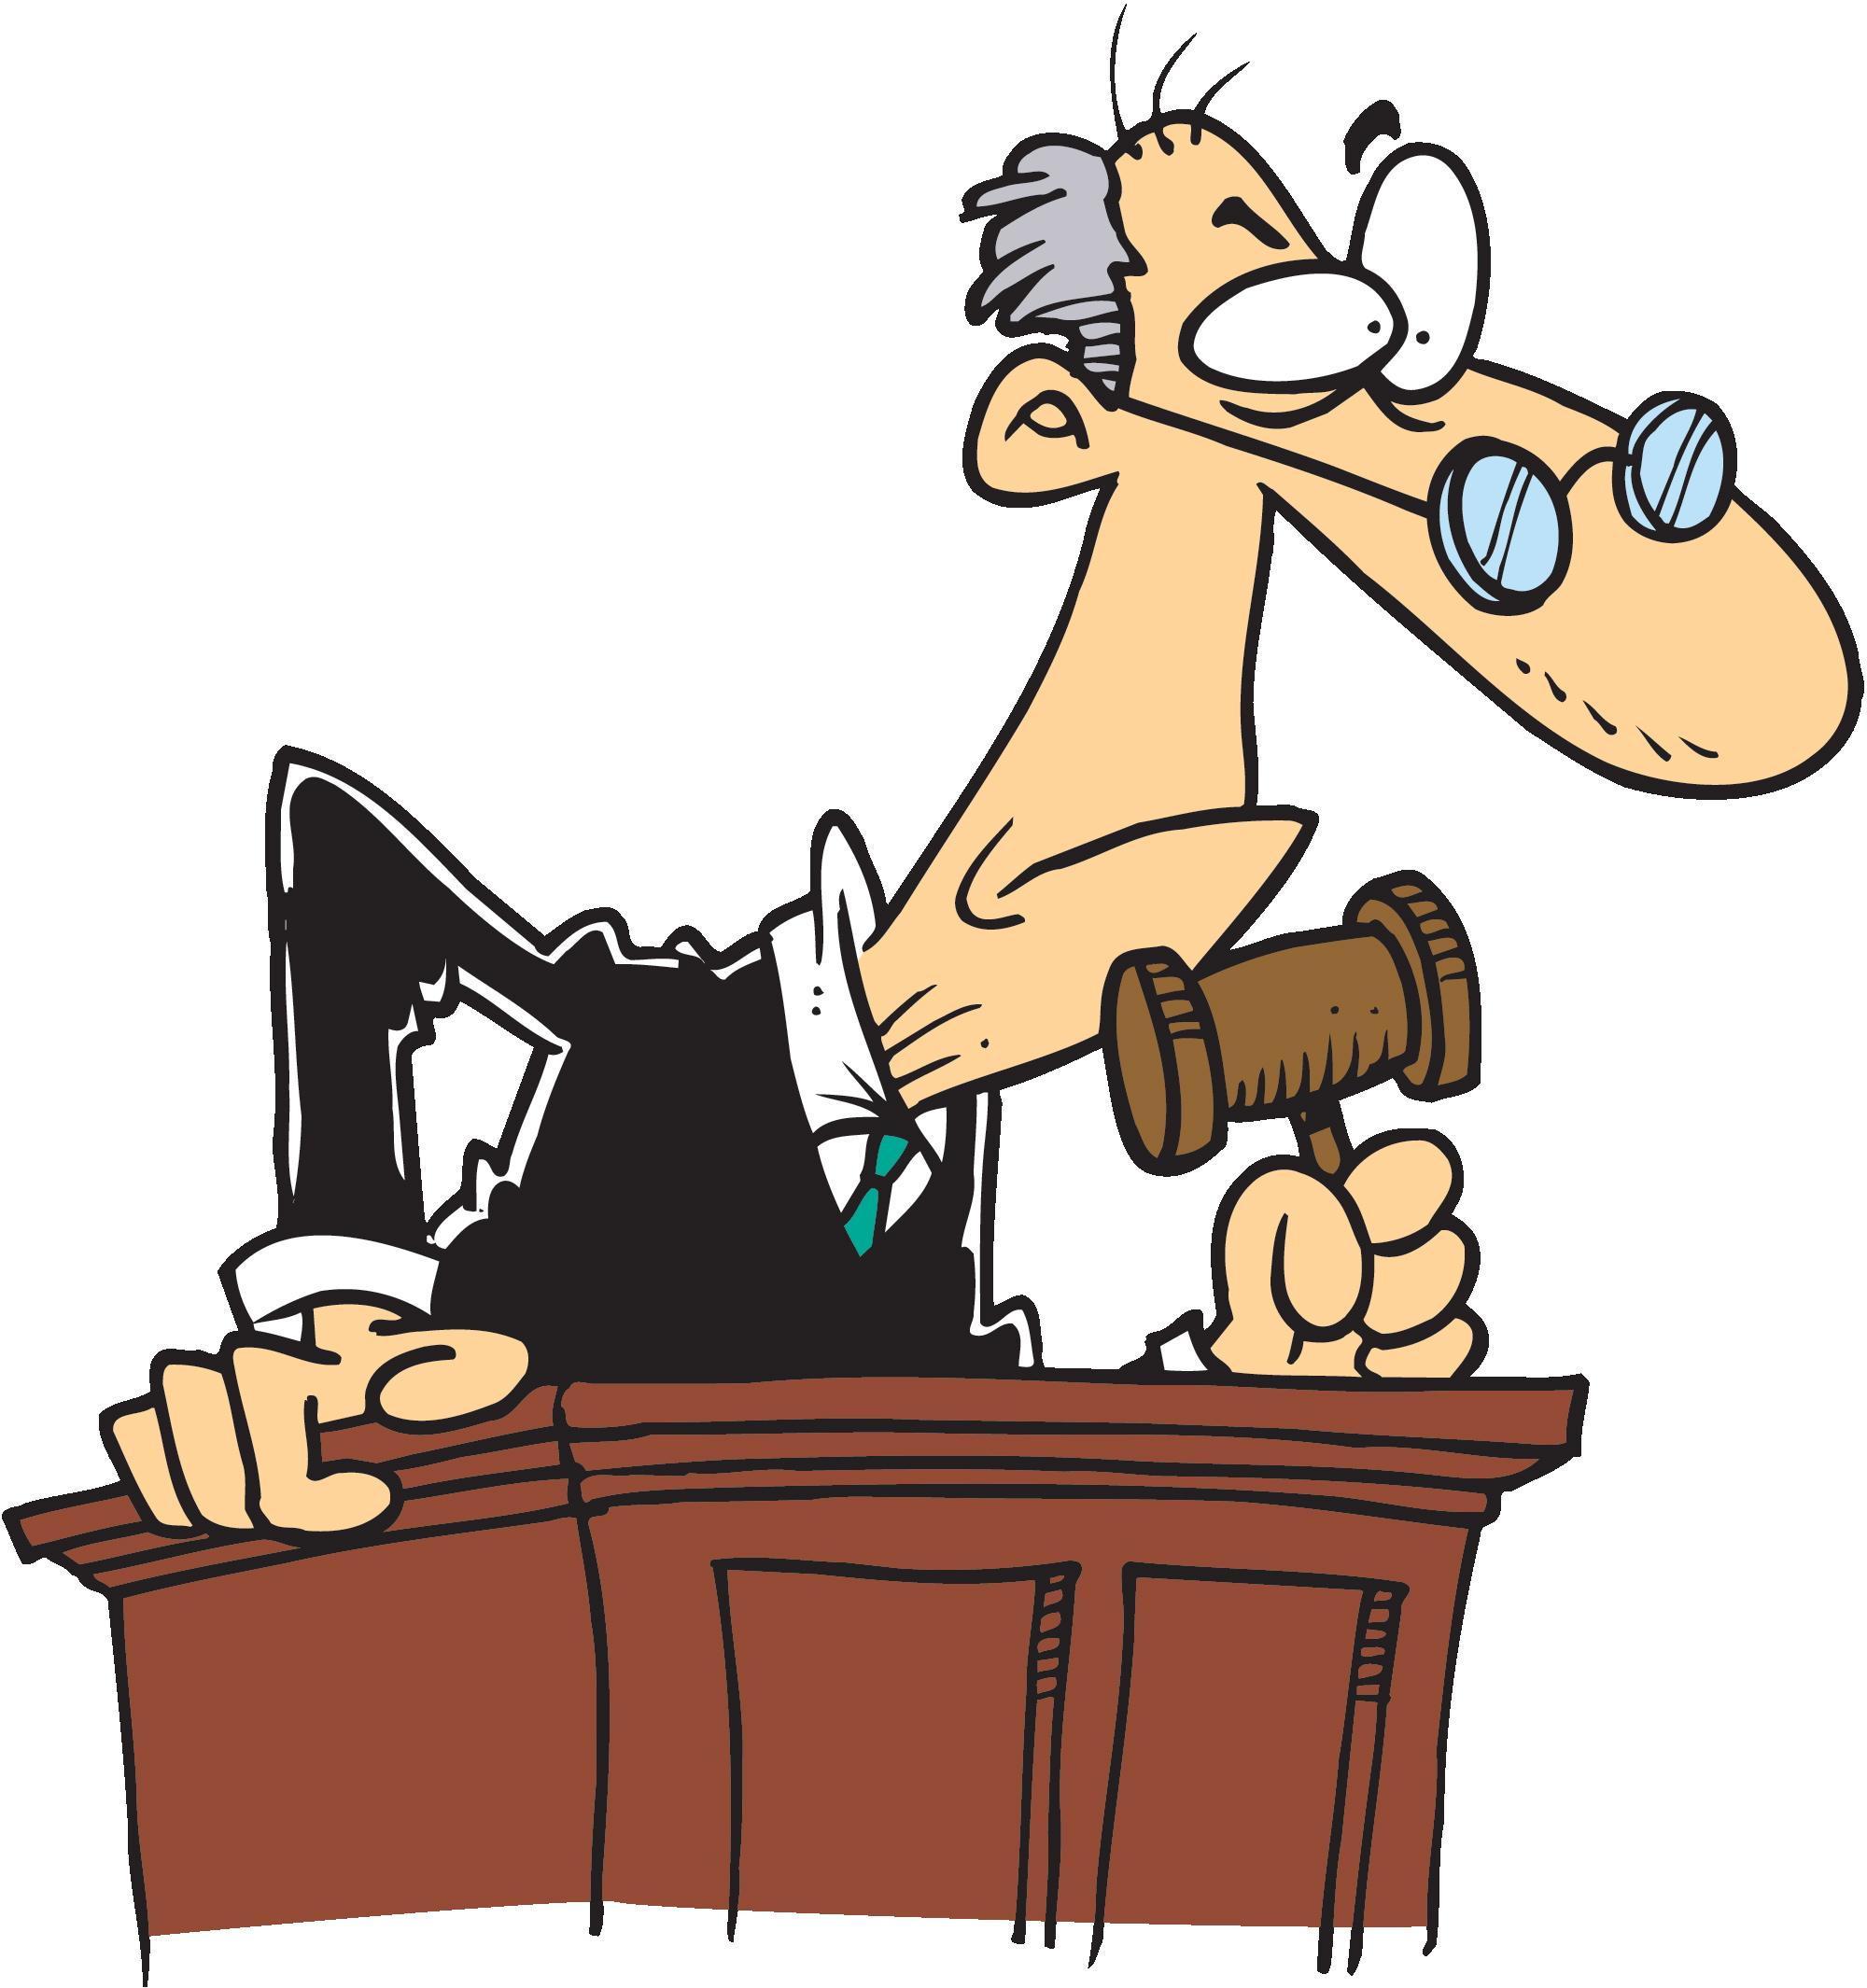 Free cliparts download clip. Court clipart court judge